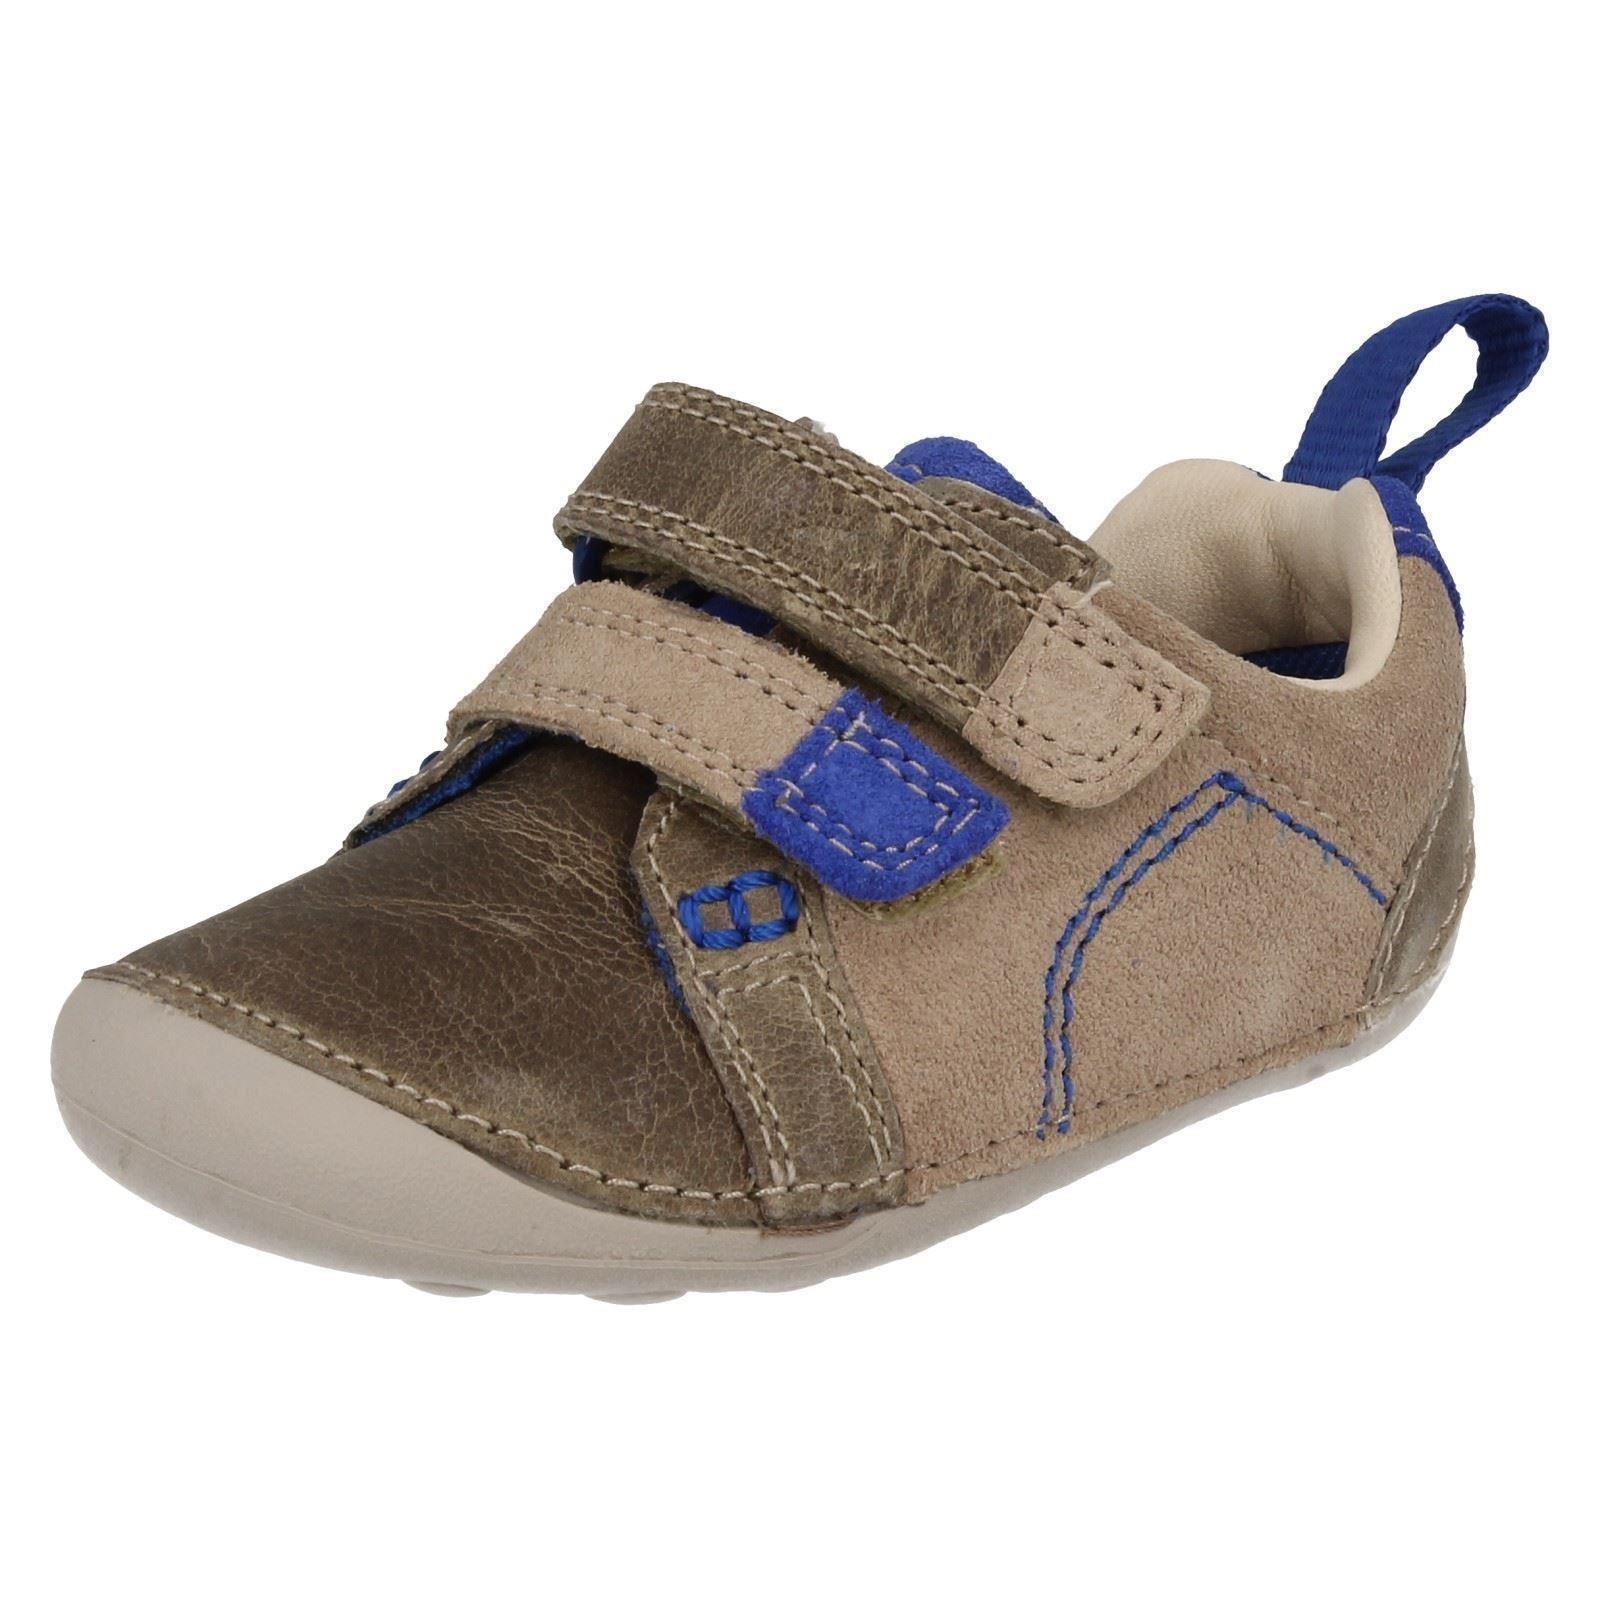 Boys Clarks Cruiser Shoes /'Tiny Soft/'